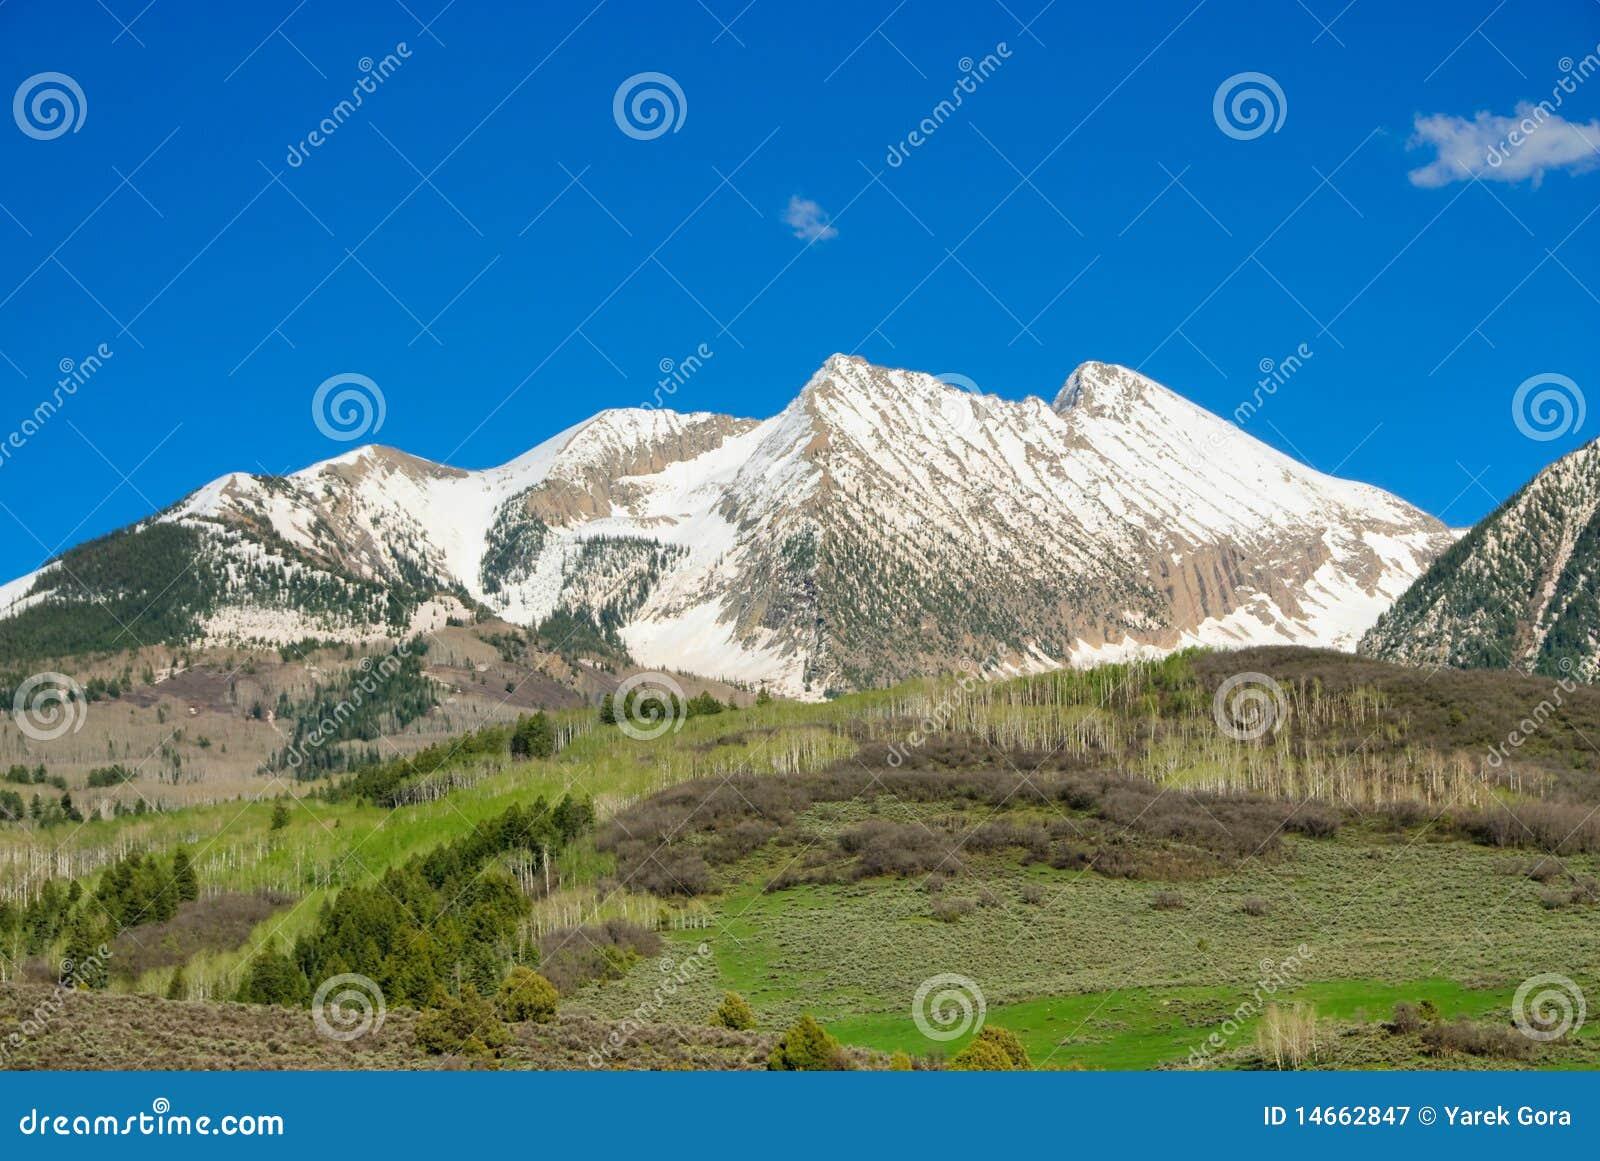 High Rockies